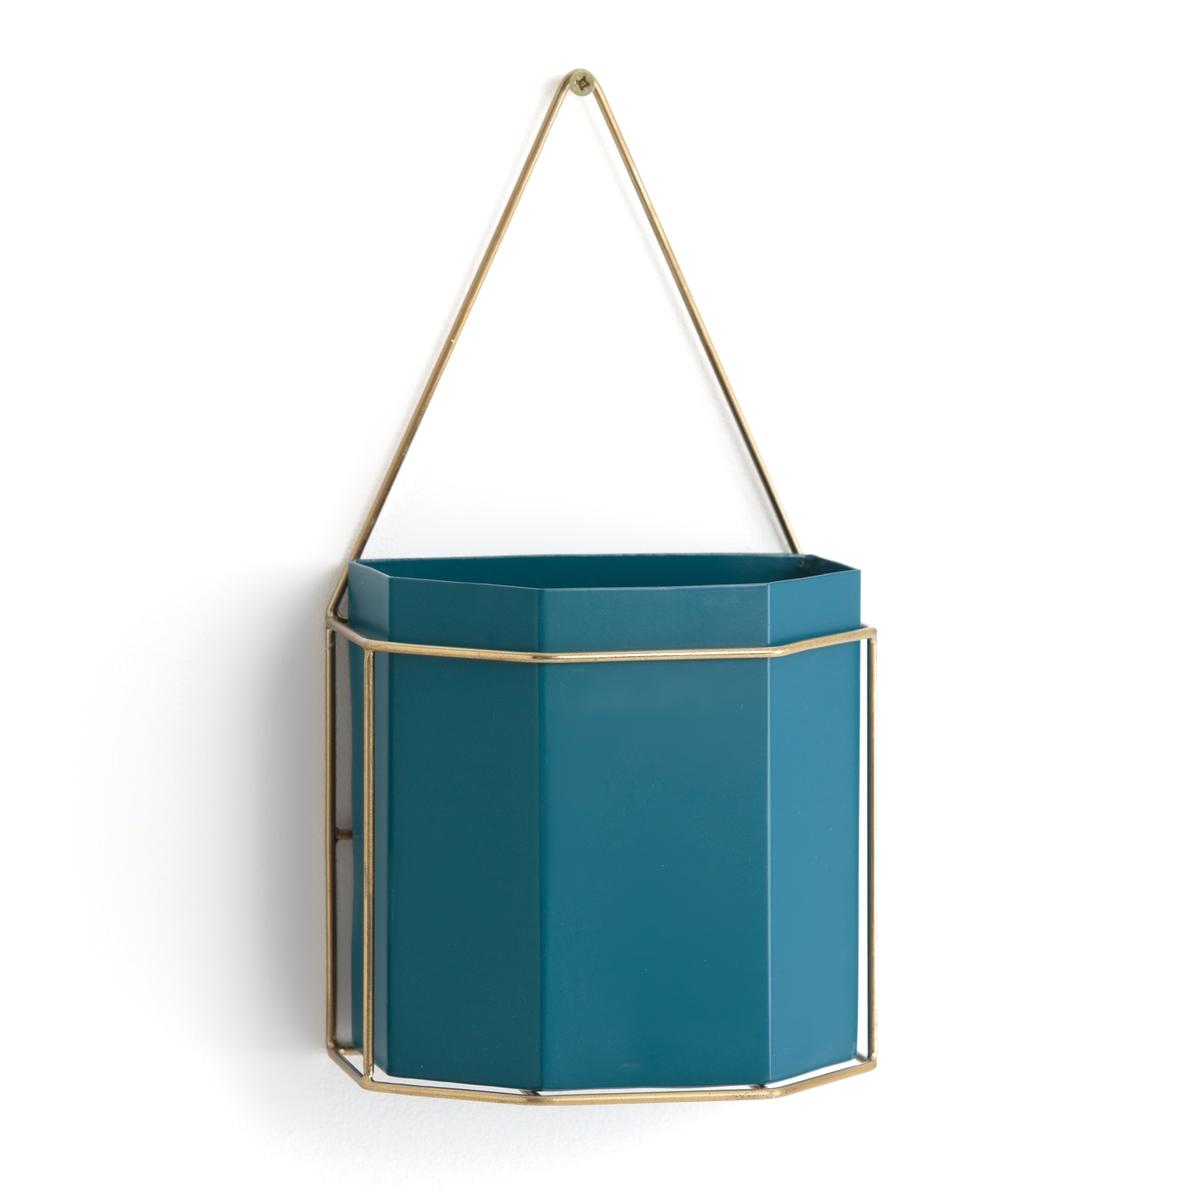 Кашпо La Redoute На стену из металла UYOVA единый размер синий зеркала la redoute uyova в форме домика единый размер желтый